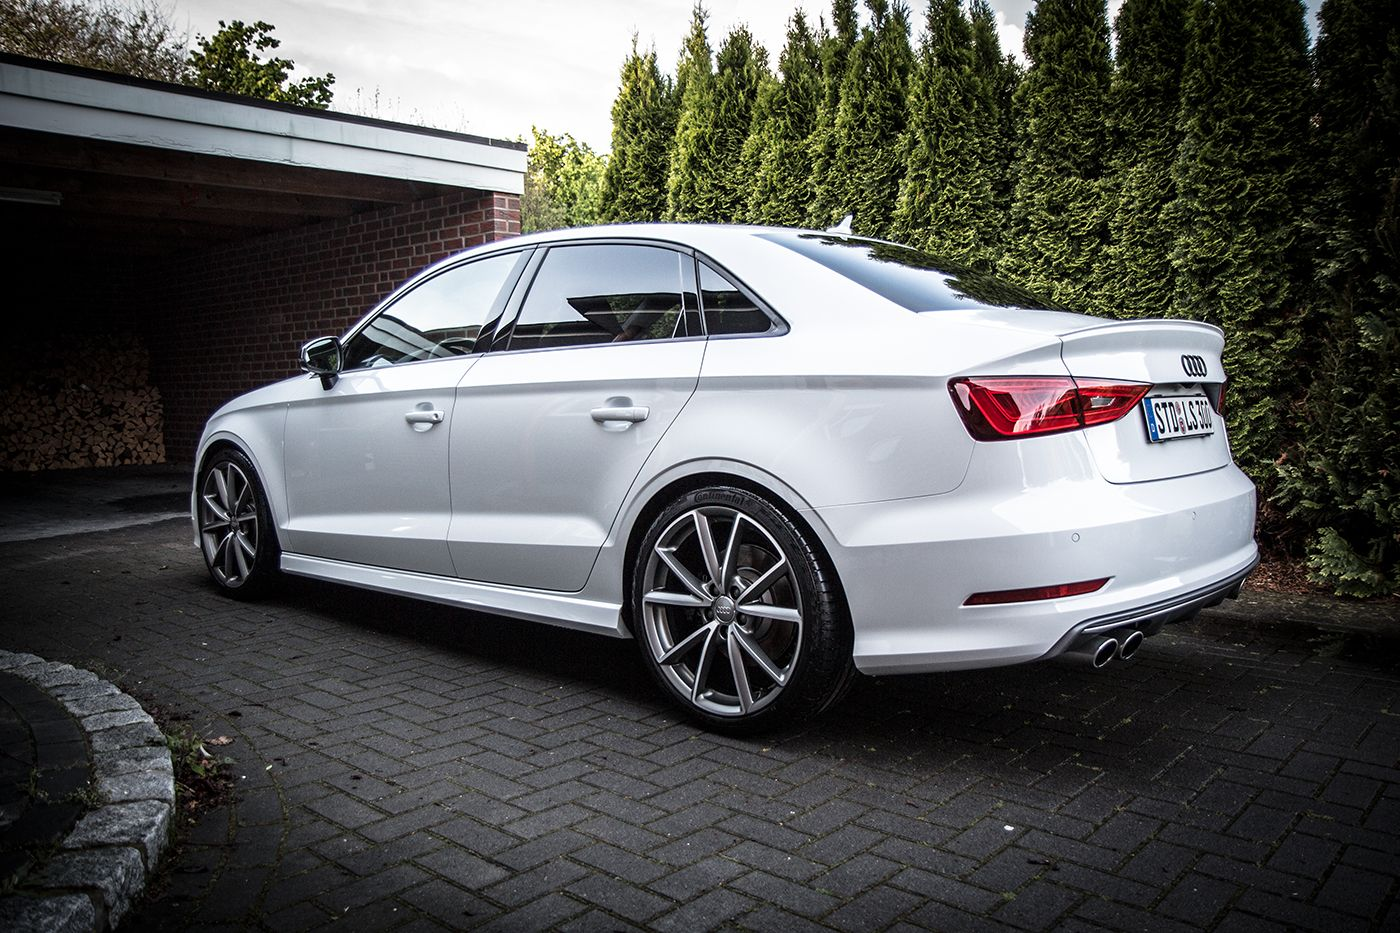 Pin by @plusmore on Audifever | Pinterest | Audi, Audi a3 and Audi a3 sedan